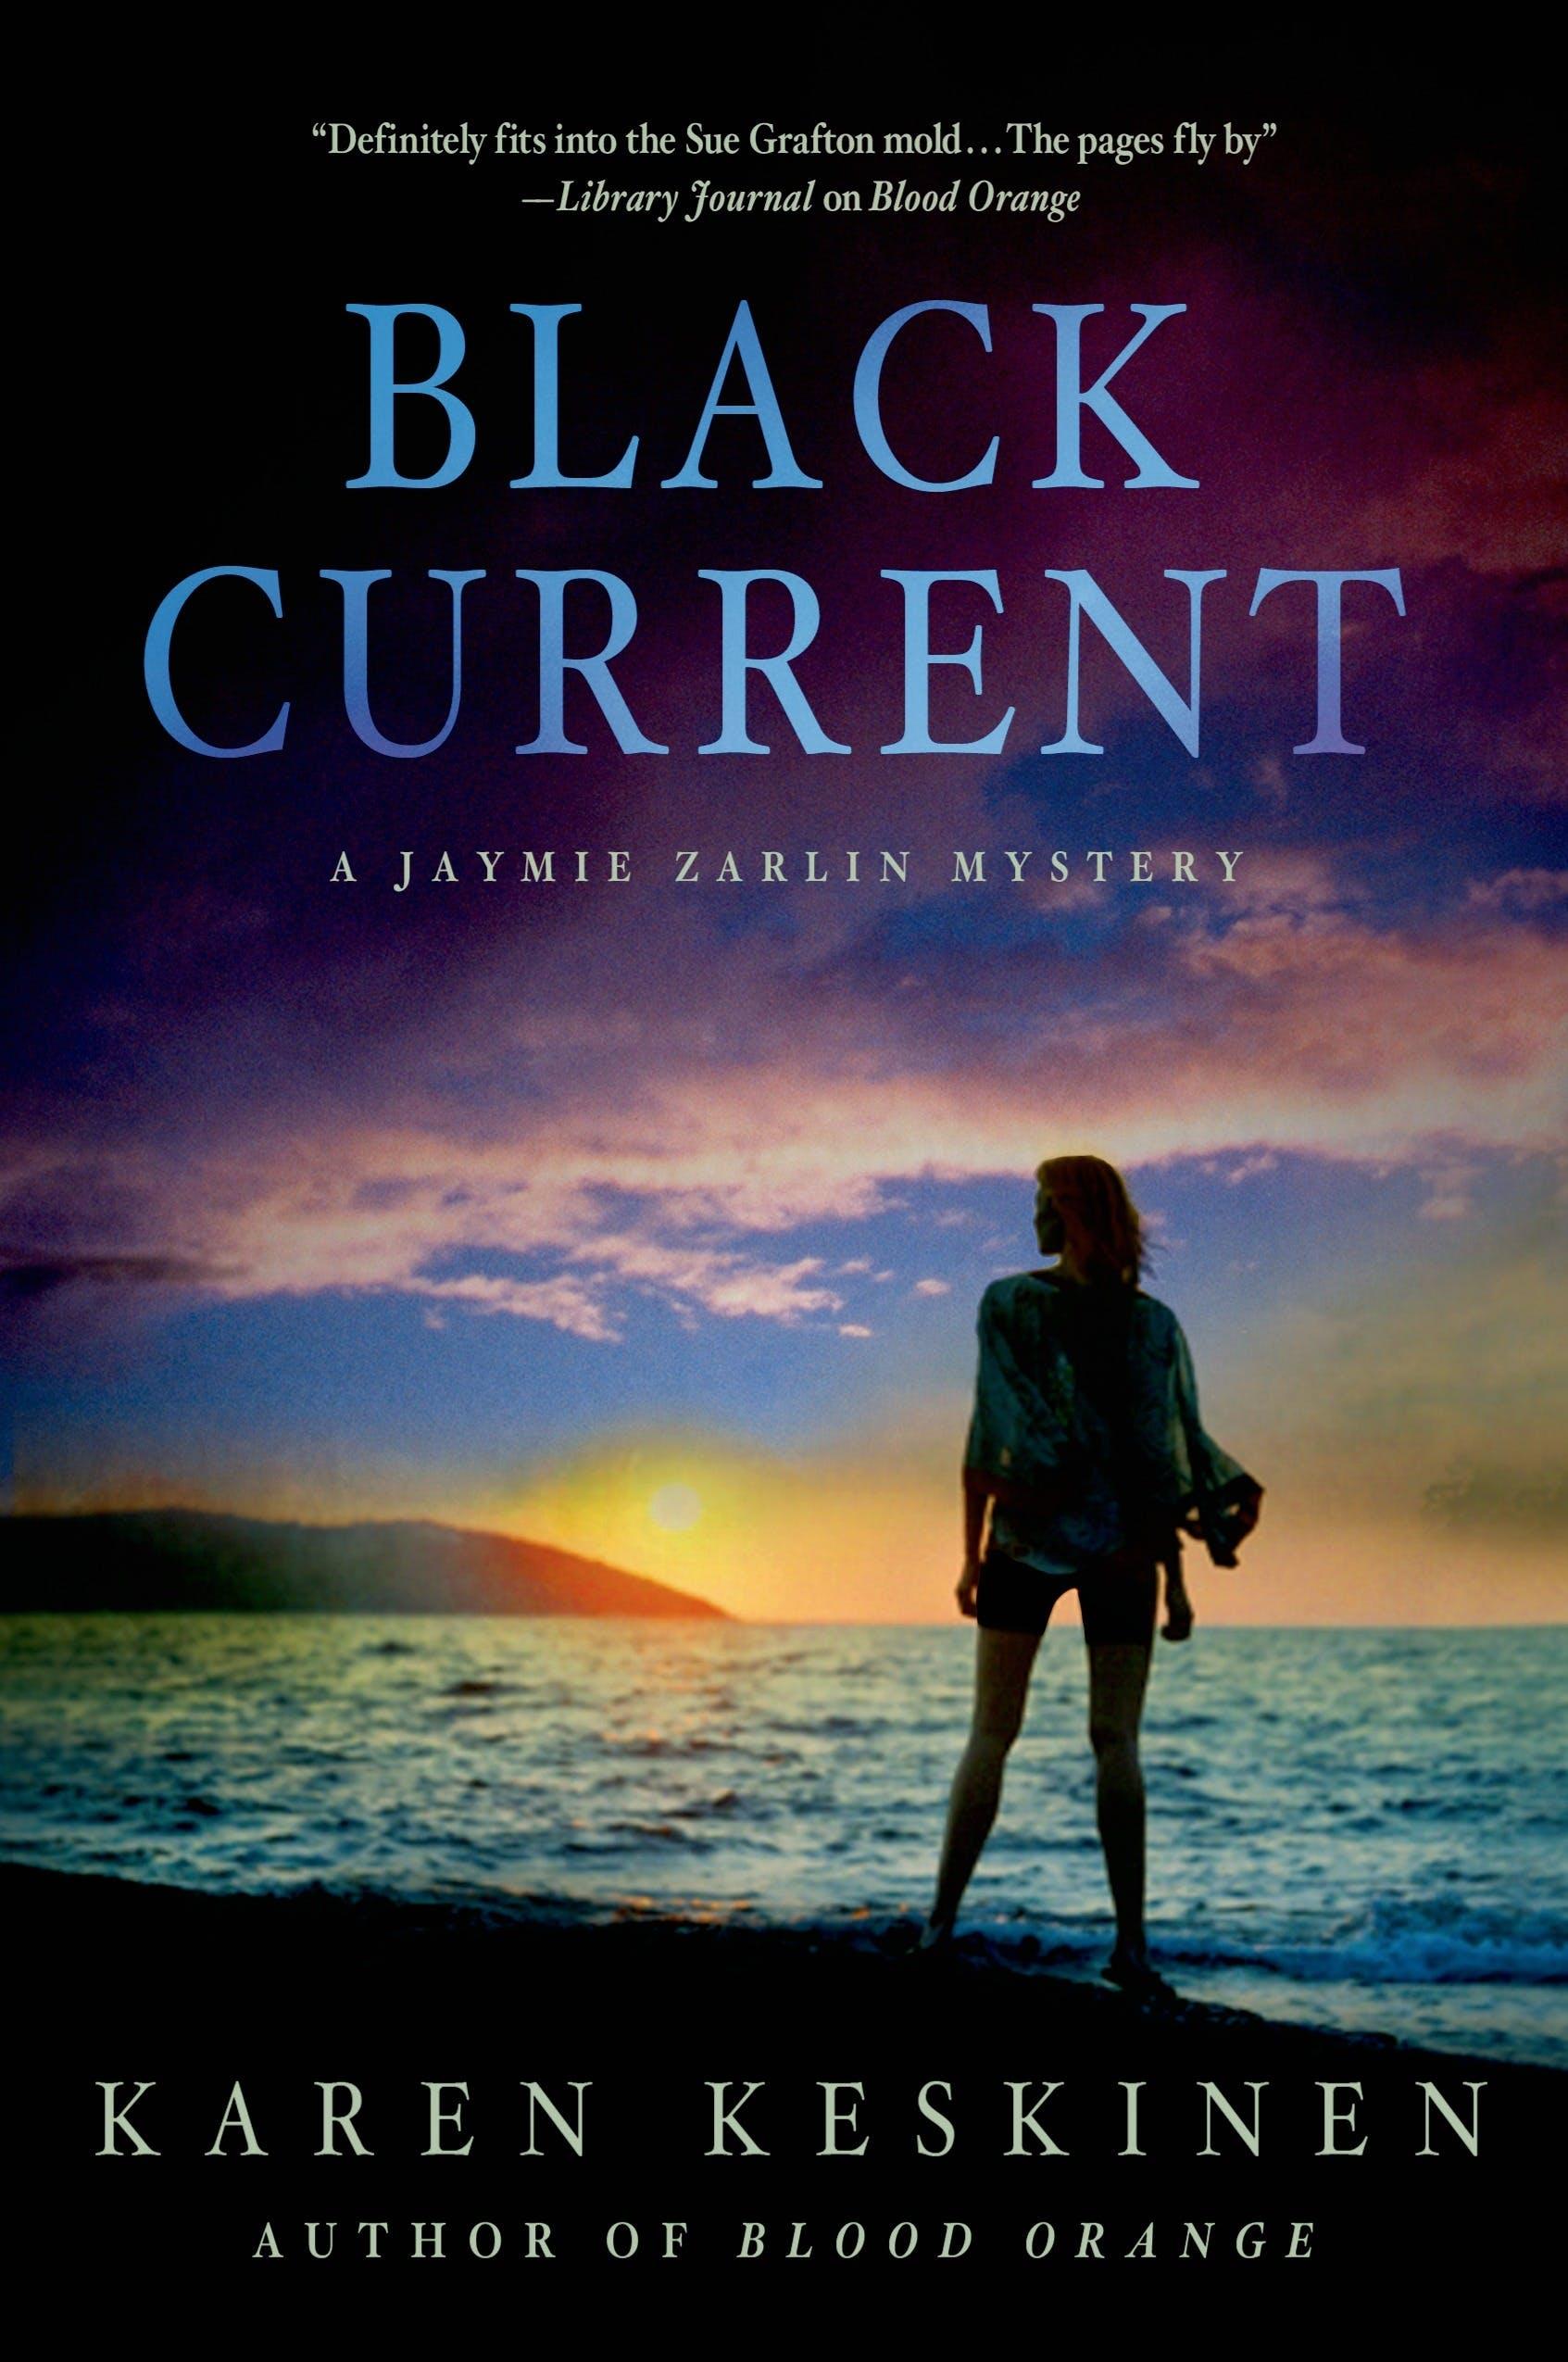 Image of Black Current